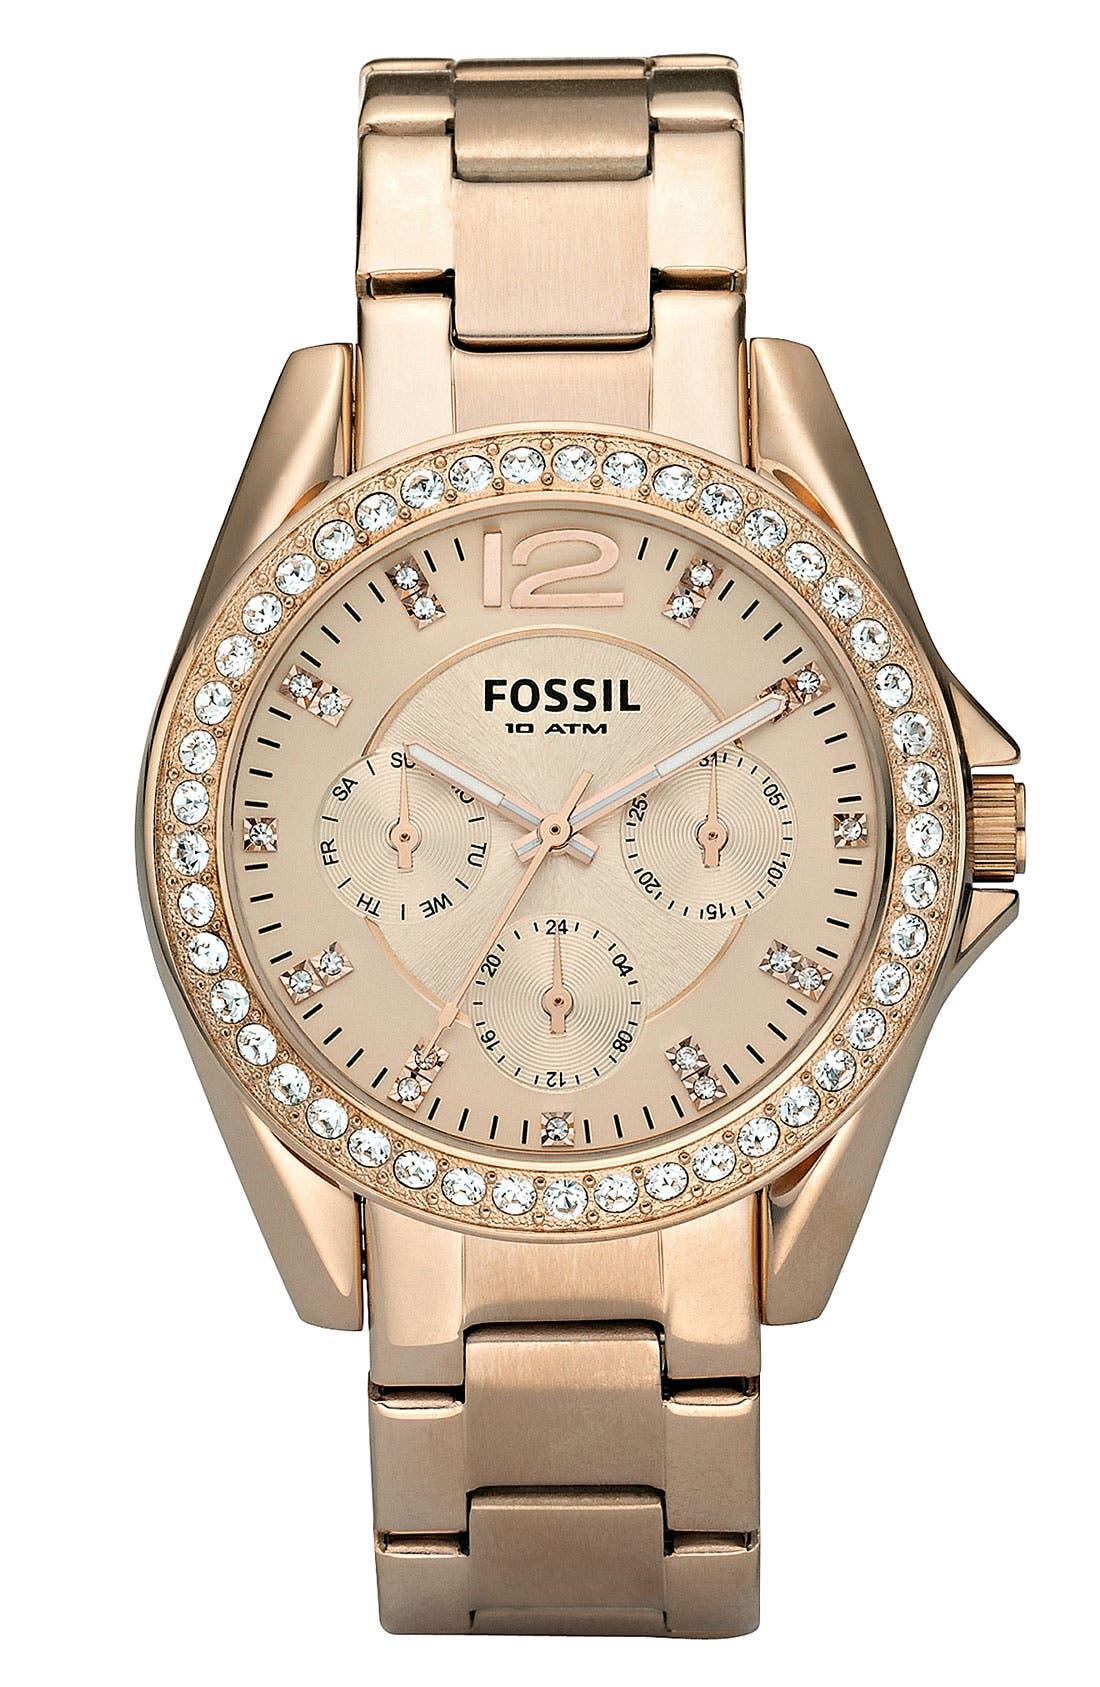 FOSSIL 'Riley' Round Crystal Bezel Bracelet Watch, 38mm, Main, color, ROSE GOLD